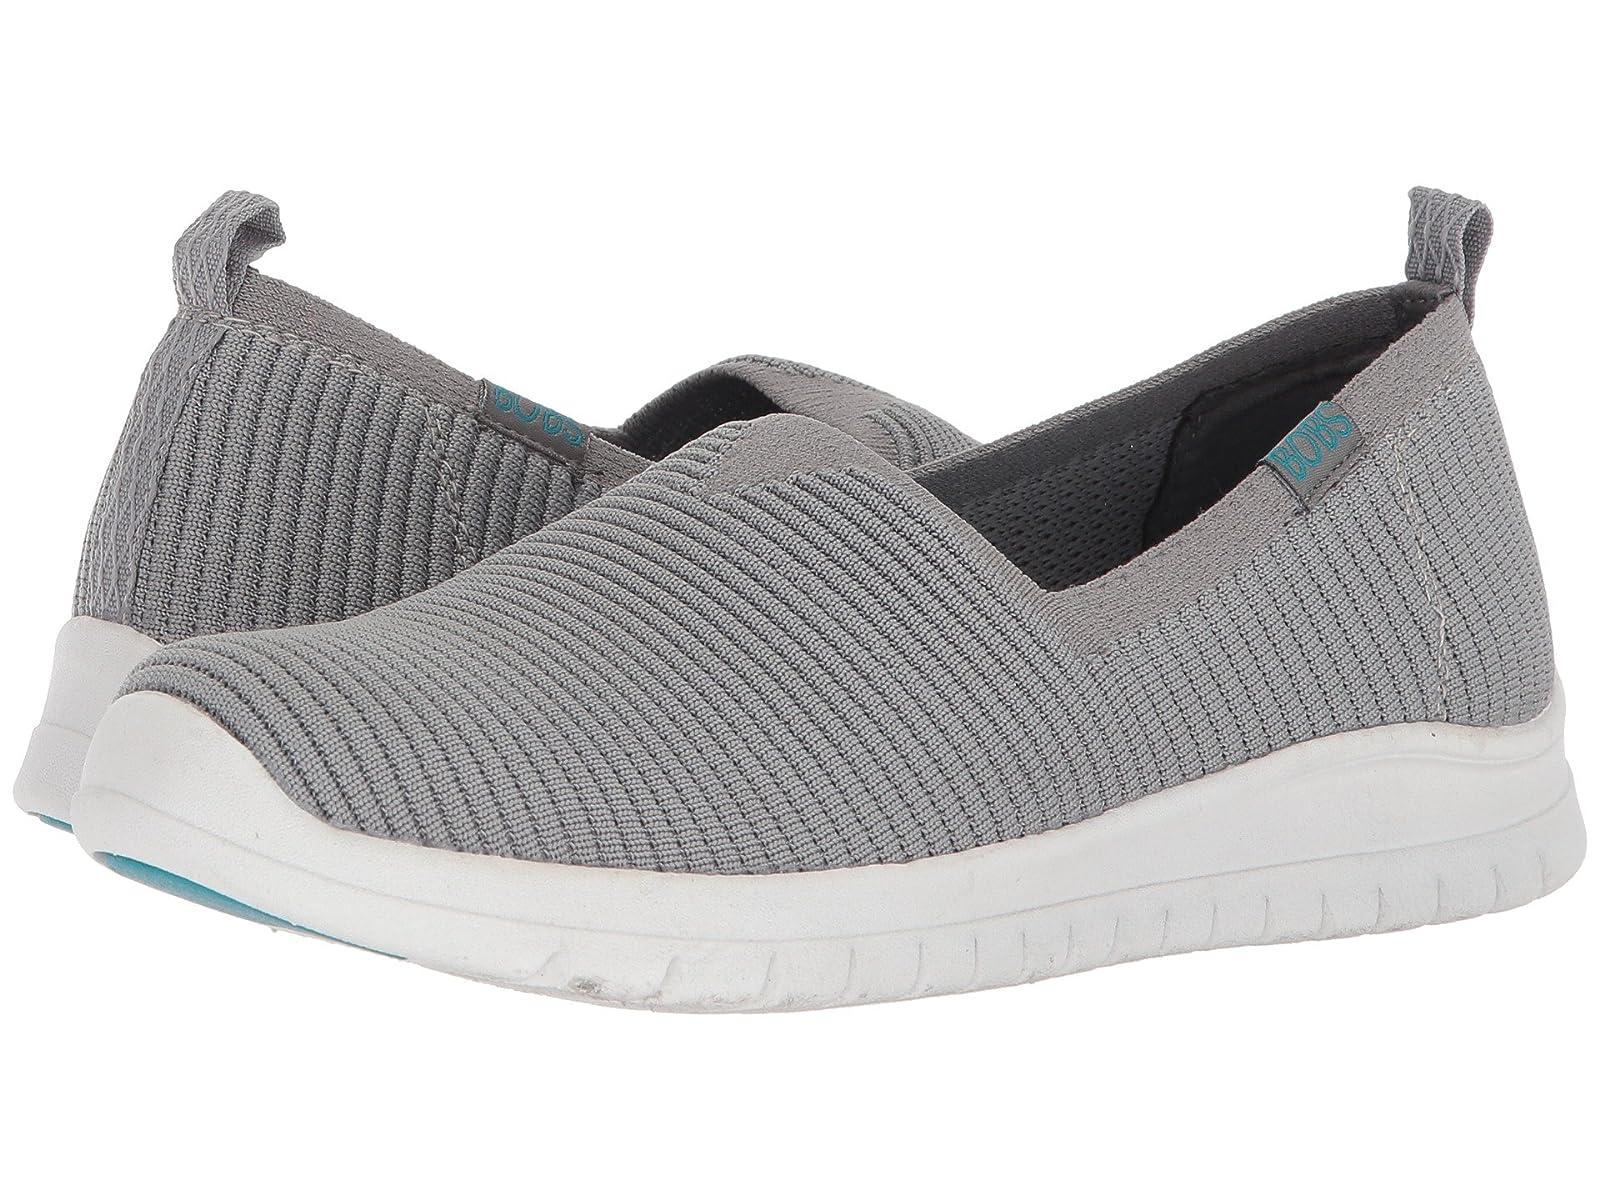 BOBS from SKECHERS Pureflex 3 - WondererAtmospheric grades have affordable shoes